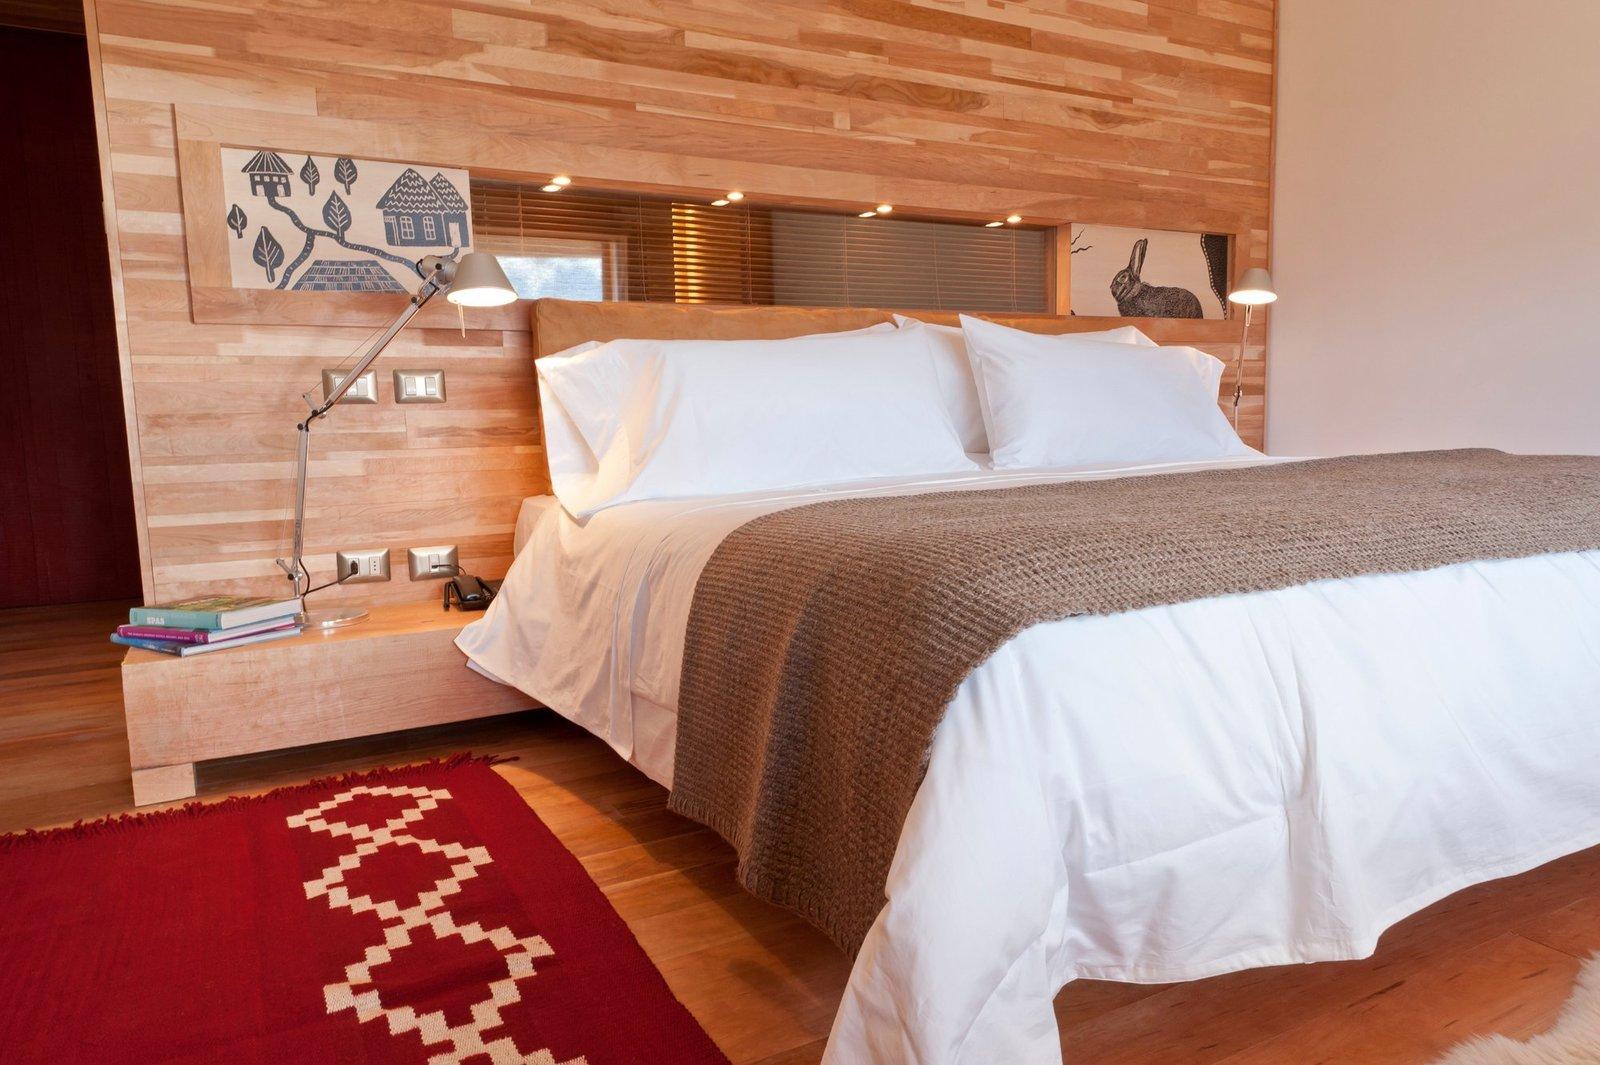 Bedroom, Bed, Medium Hardwood Floor, Table Lighting, Night Stands, and Rug Floor  Tierra Patagonia Hotel & Spa